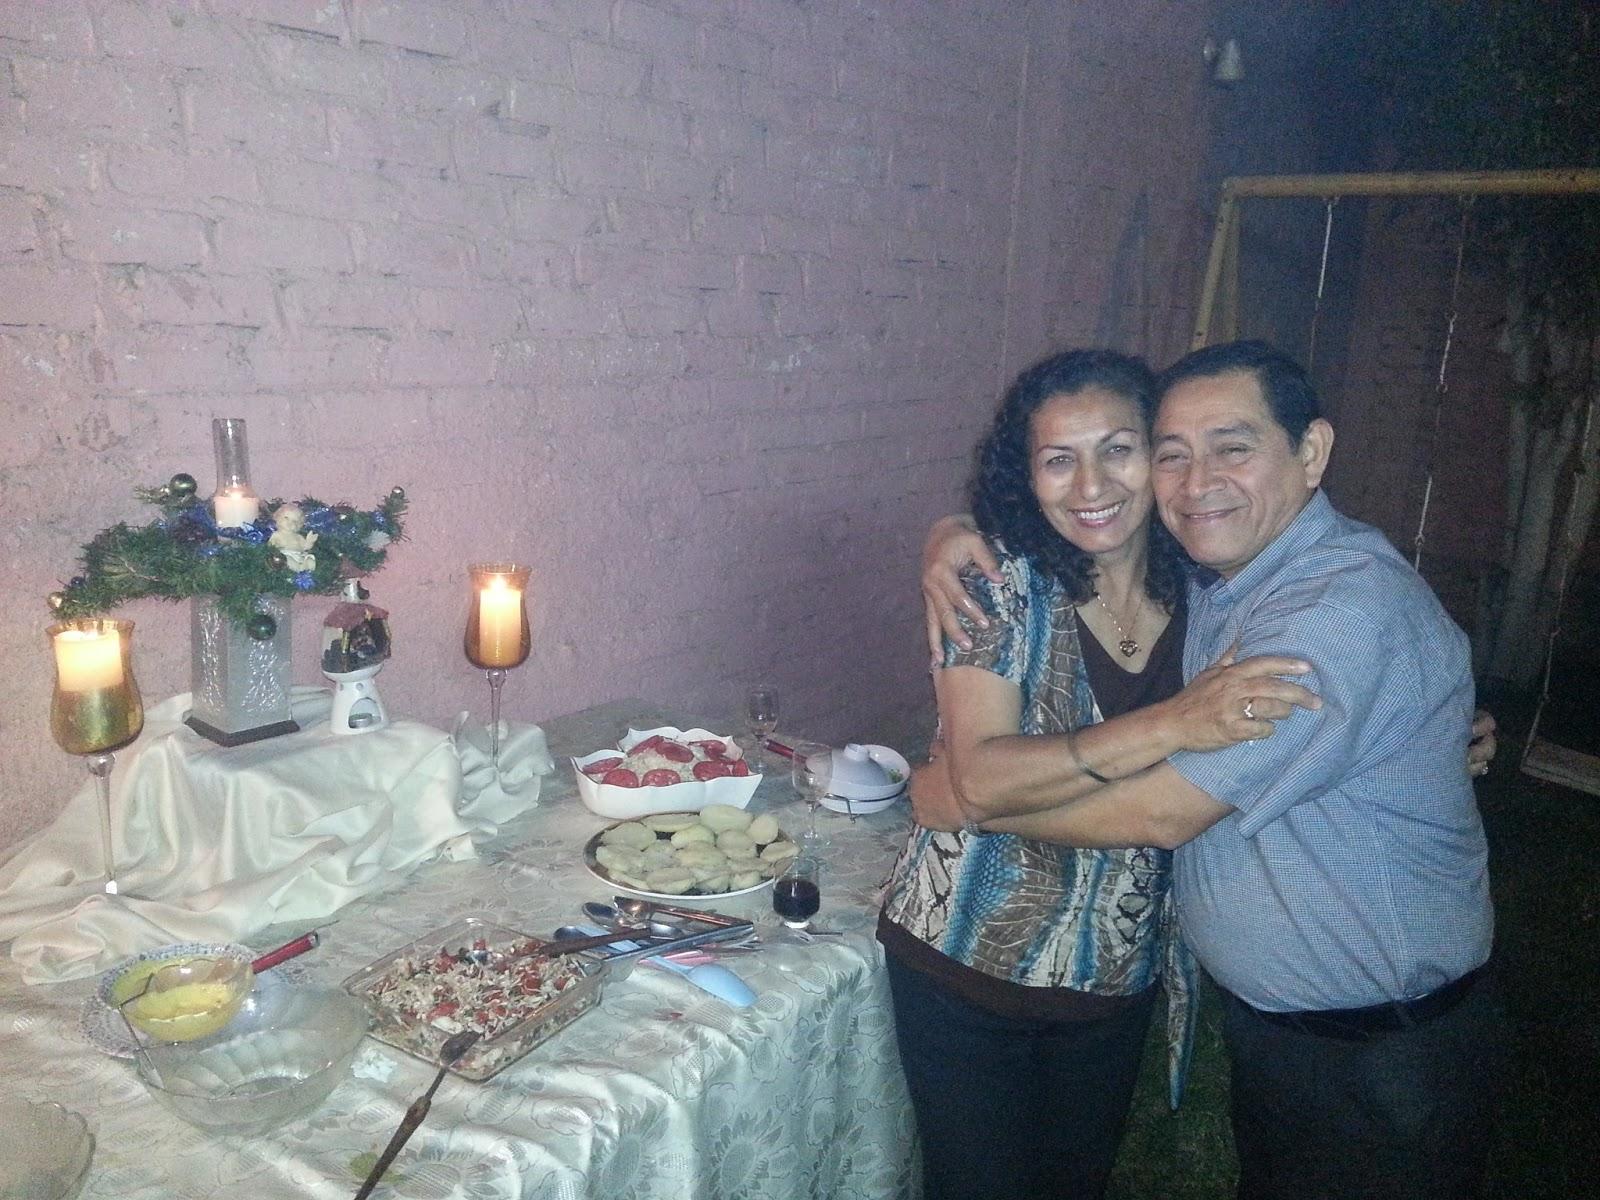 Matrimonio Catolico Peru : Movimiento familiar cristiano catÓlico en perÚ el